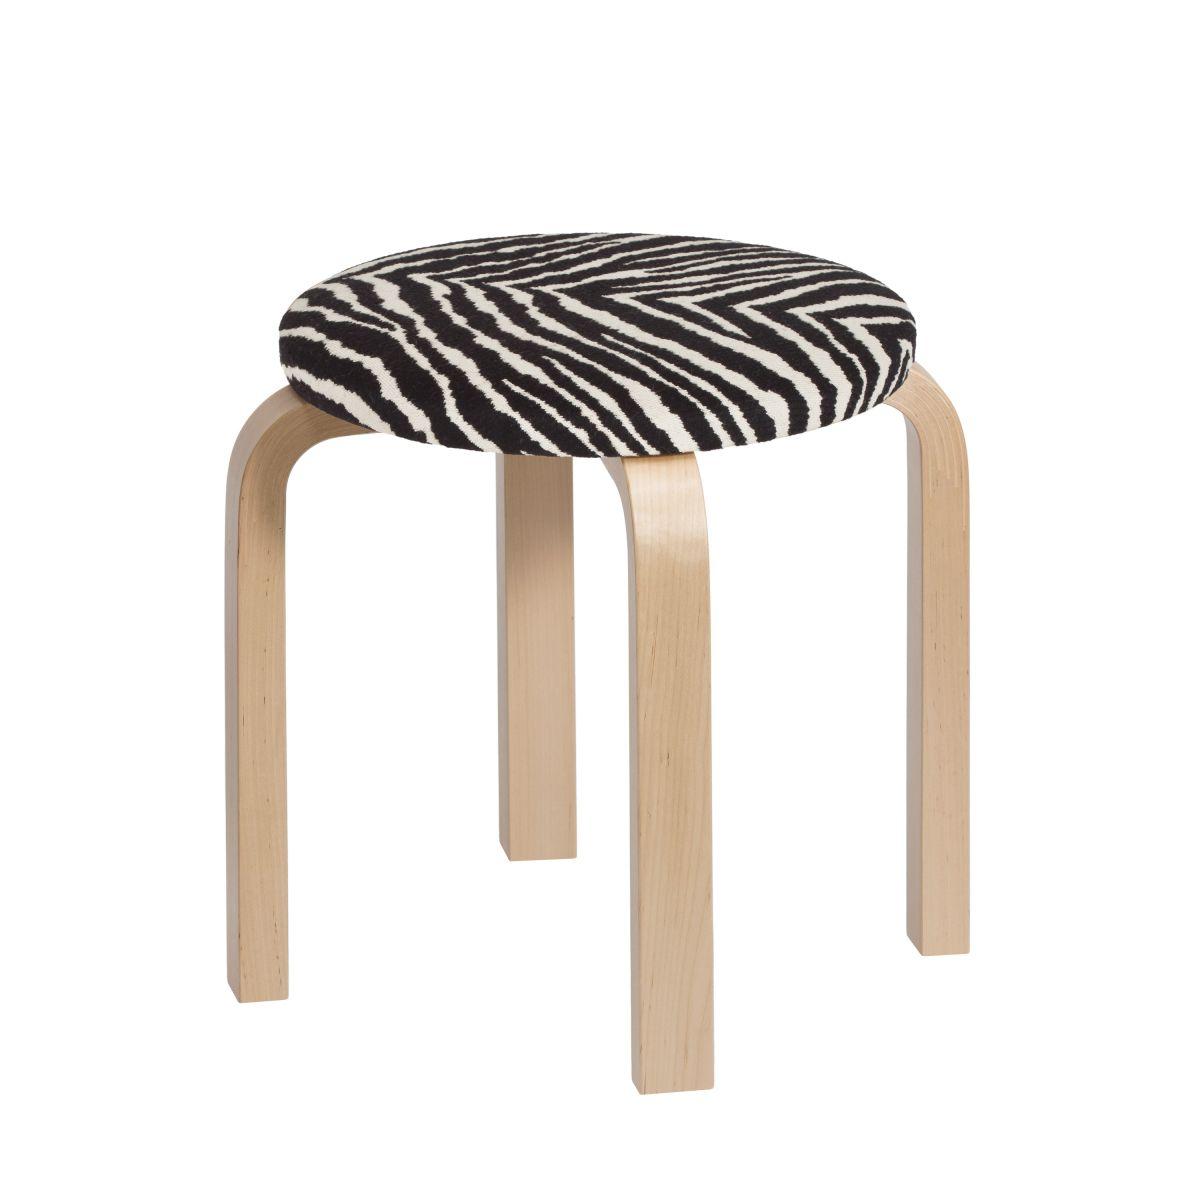 Childrens Stool Ne60 Legs Birch Seat Fabric Upholstery Zebra 2463528